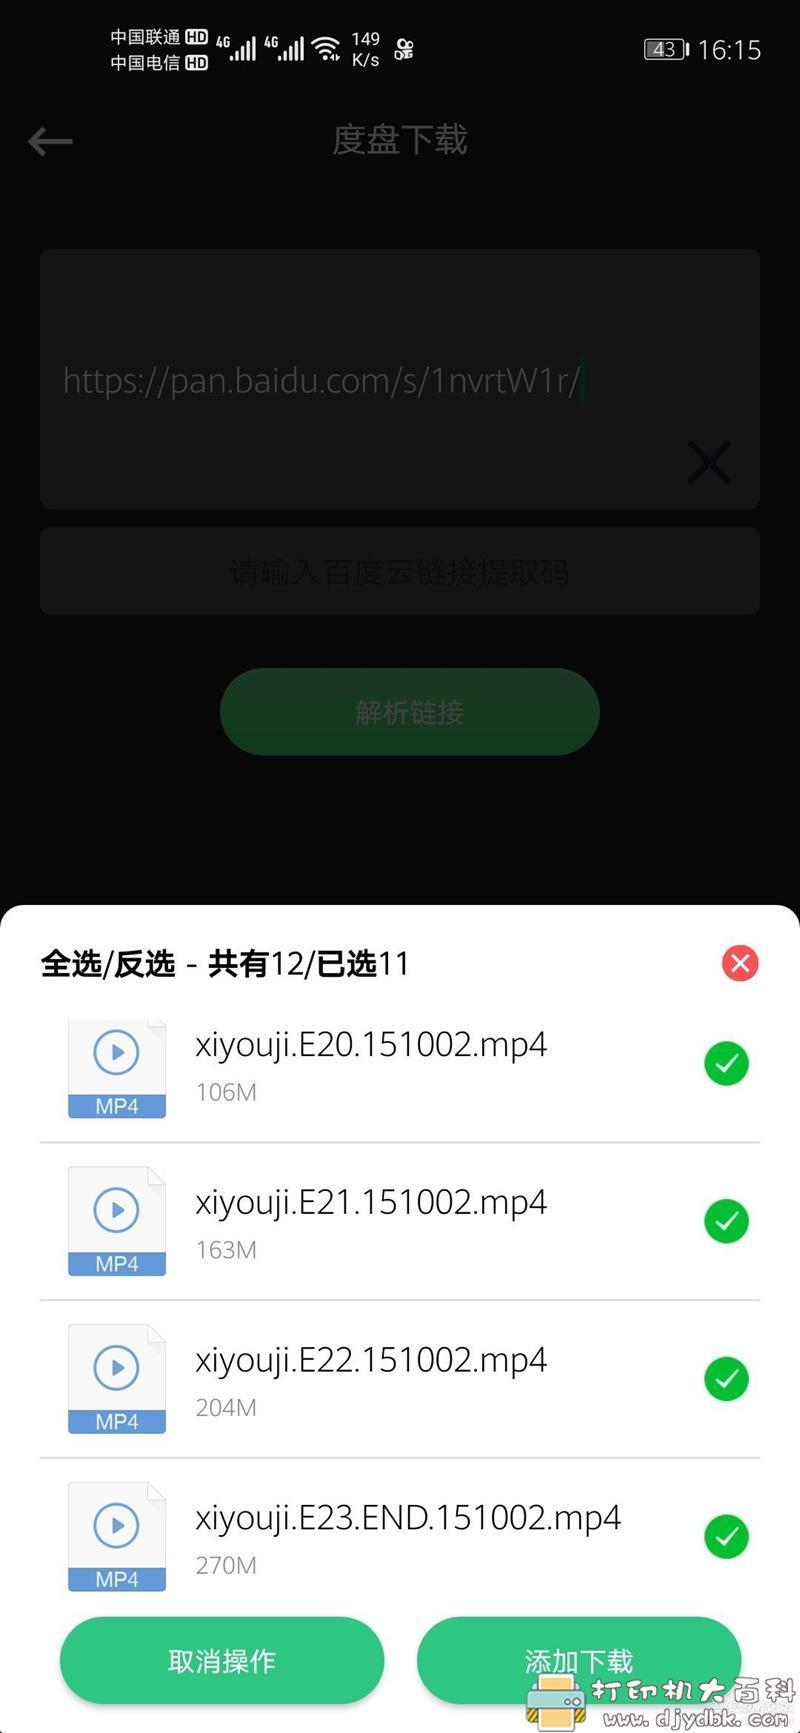 [Android]信鸽下载器v6.4,一款安卓下载工具,多线程下载模式 配图 No.3